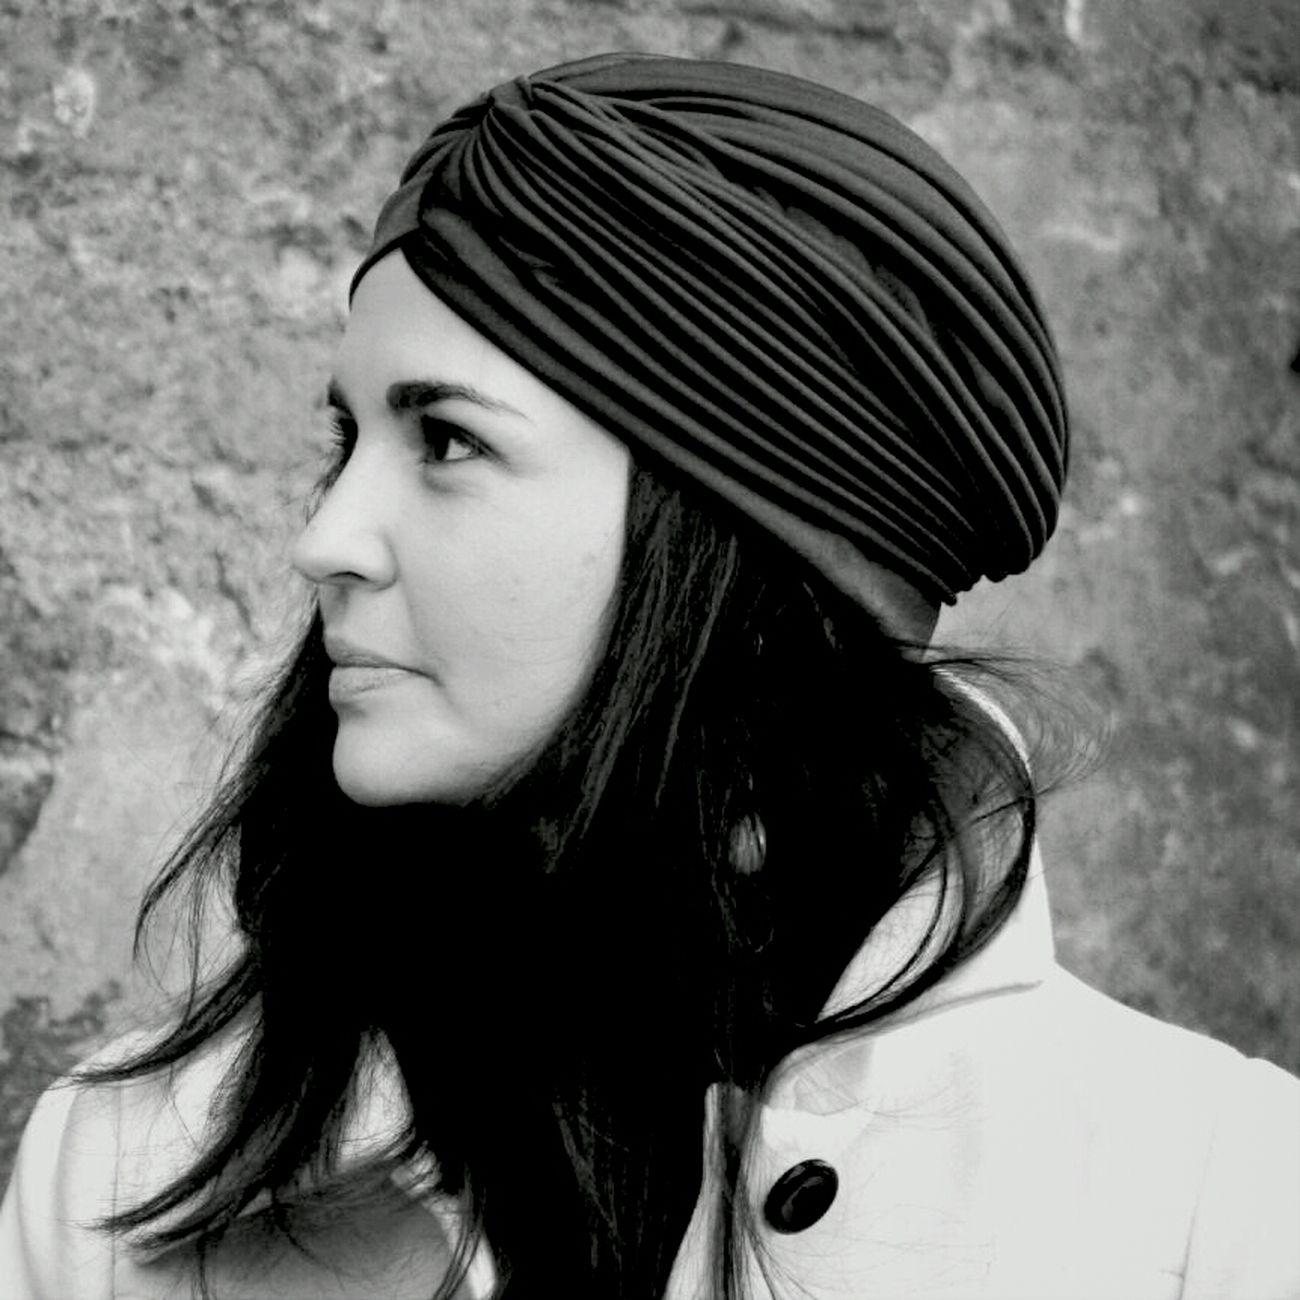 Blackandwhite Portrait Girl Bws_worldwide Italianbrother Bwstyles_gf Bws_artist_eu